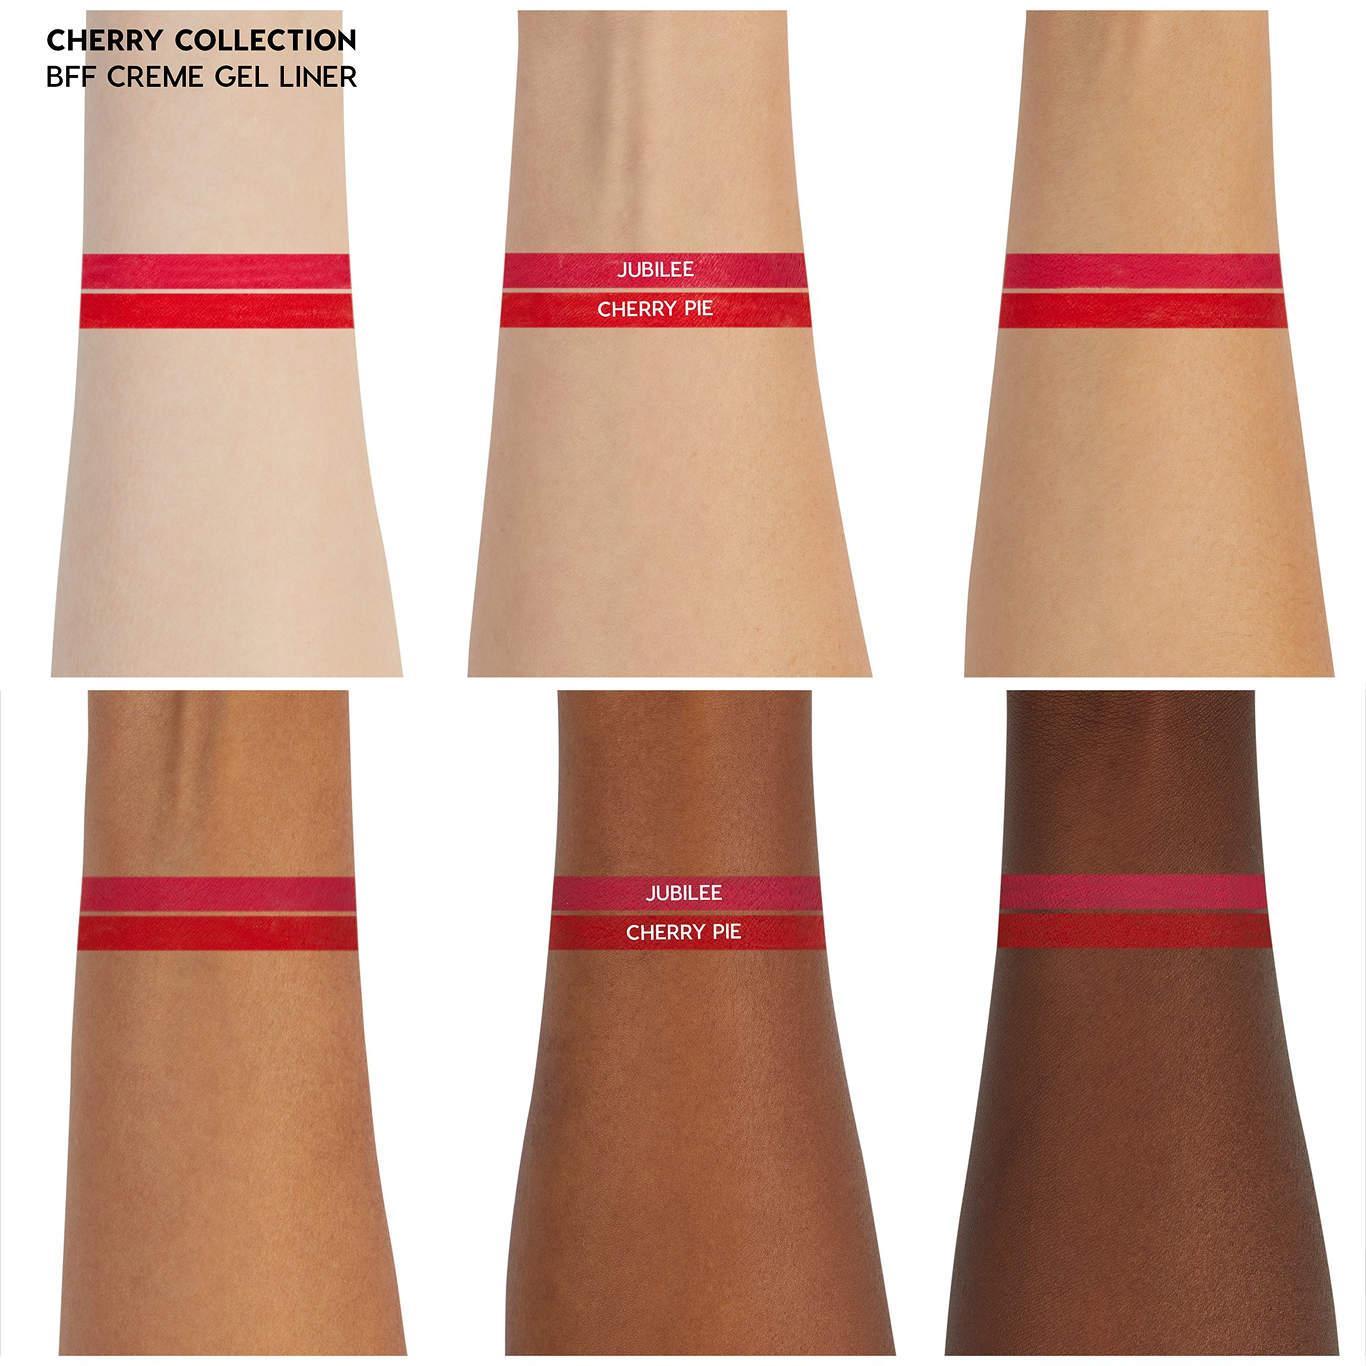 ColourPop Cherry Crush Collection ColourPop Cherry Crush Collection Creme Gel Liners Arm Swatch